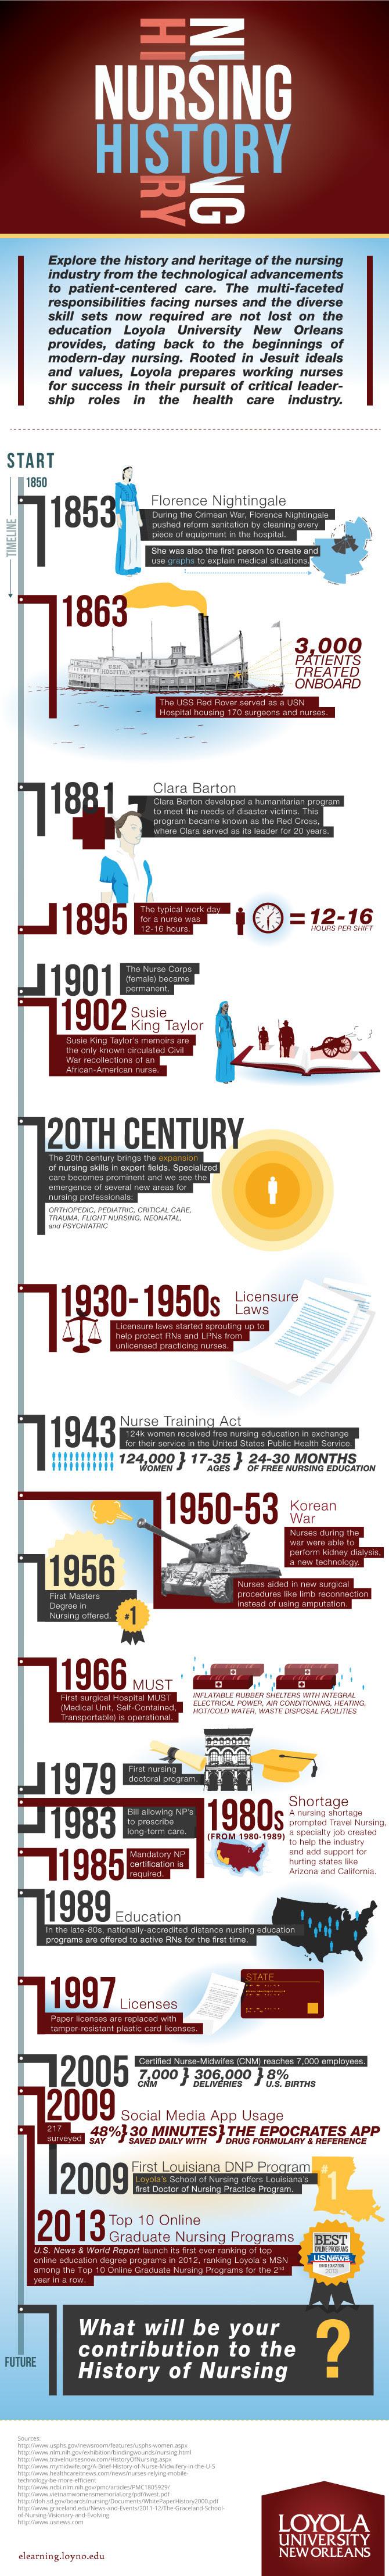 Infographic: Nursing History